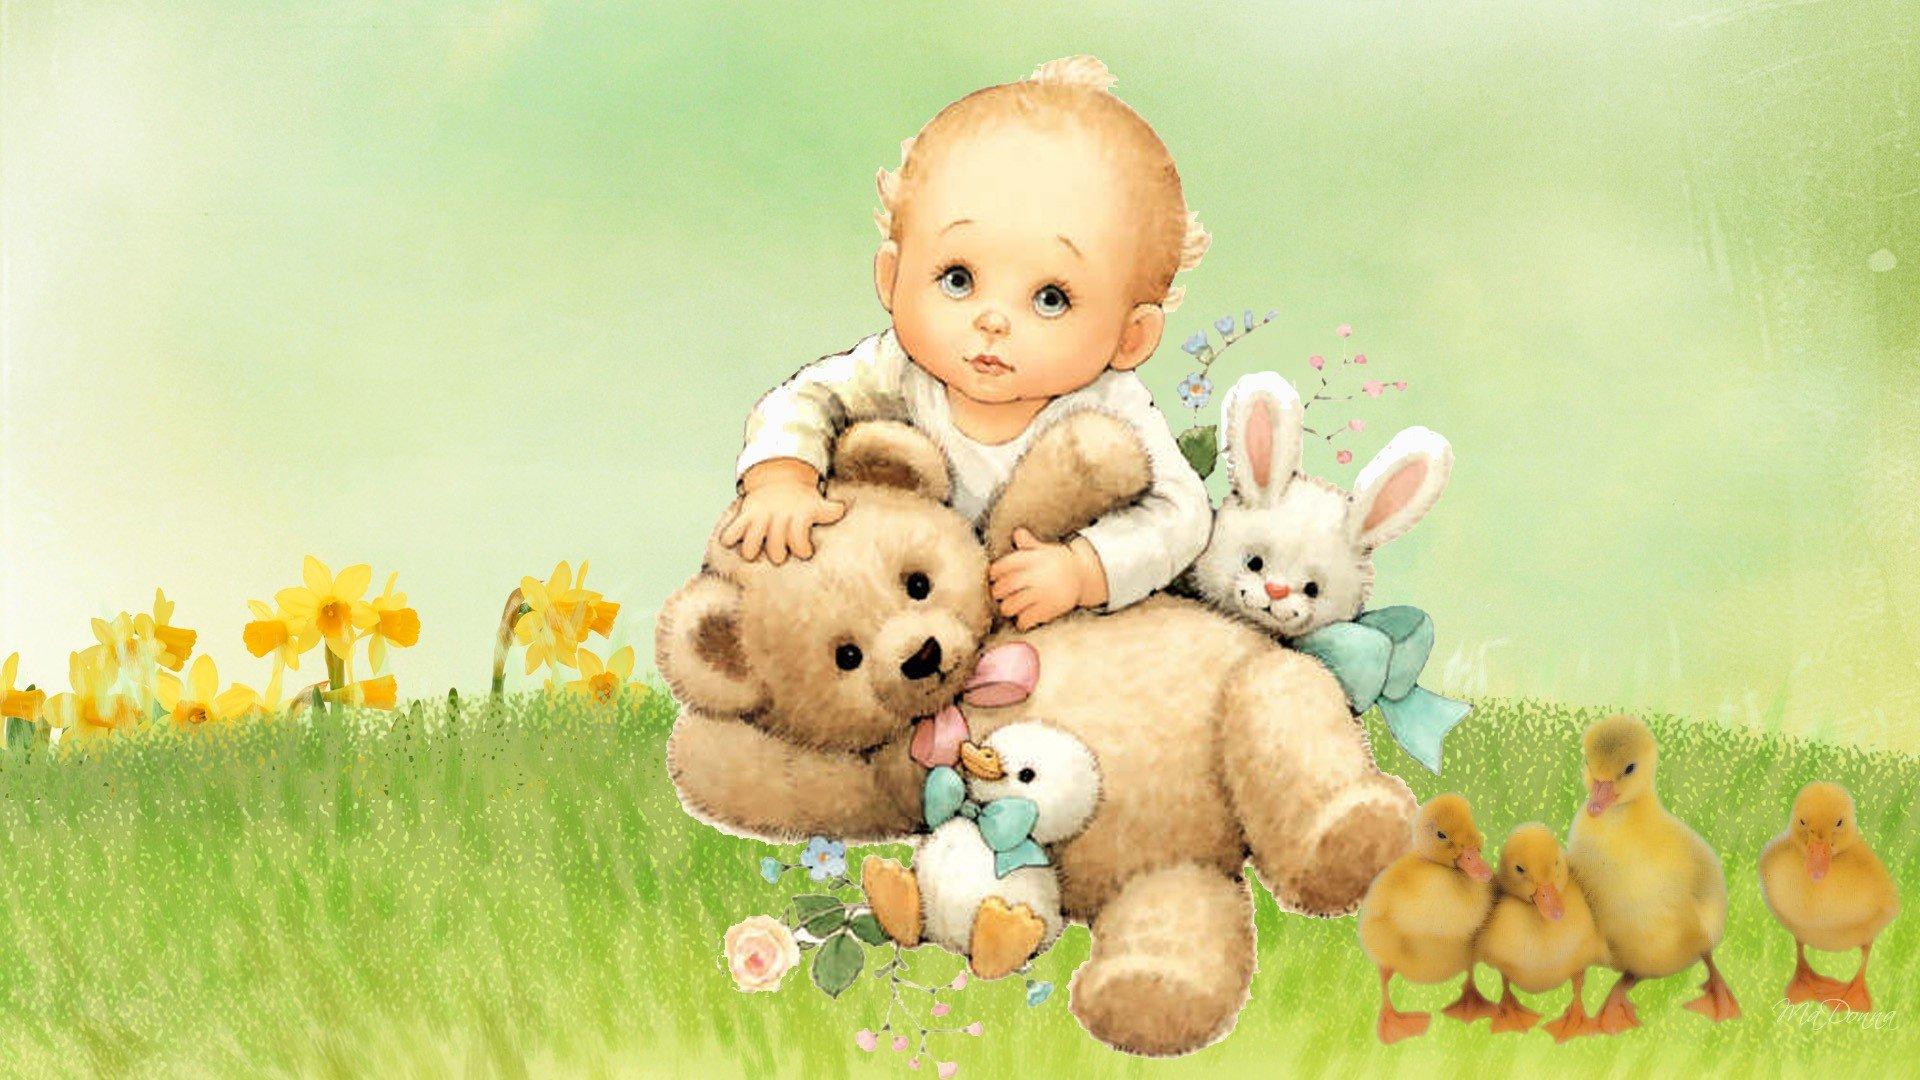 teddy bear wallpaper and